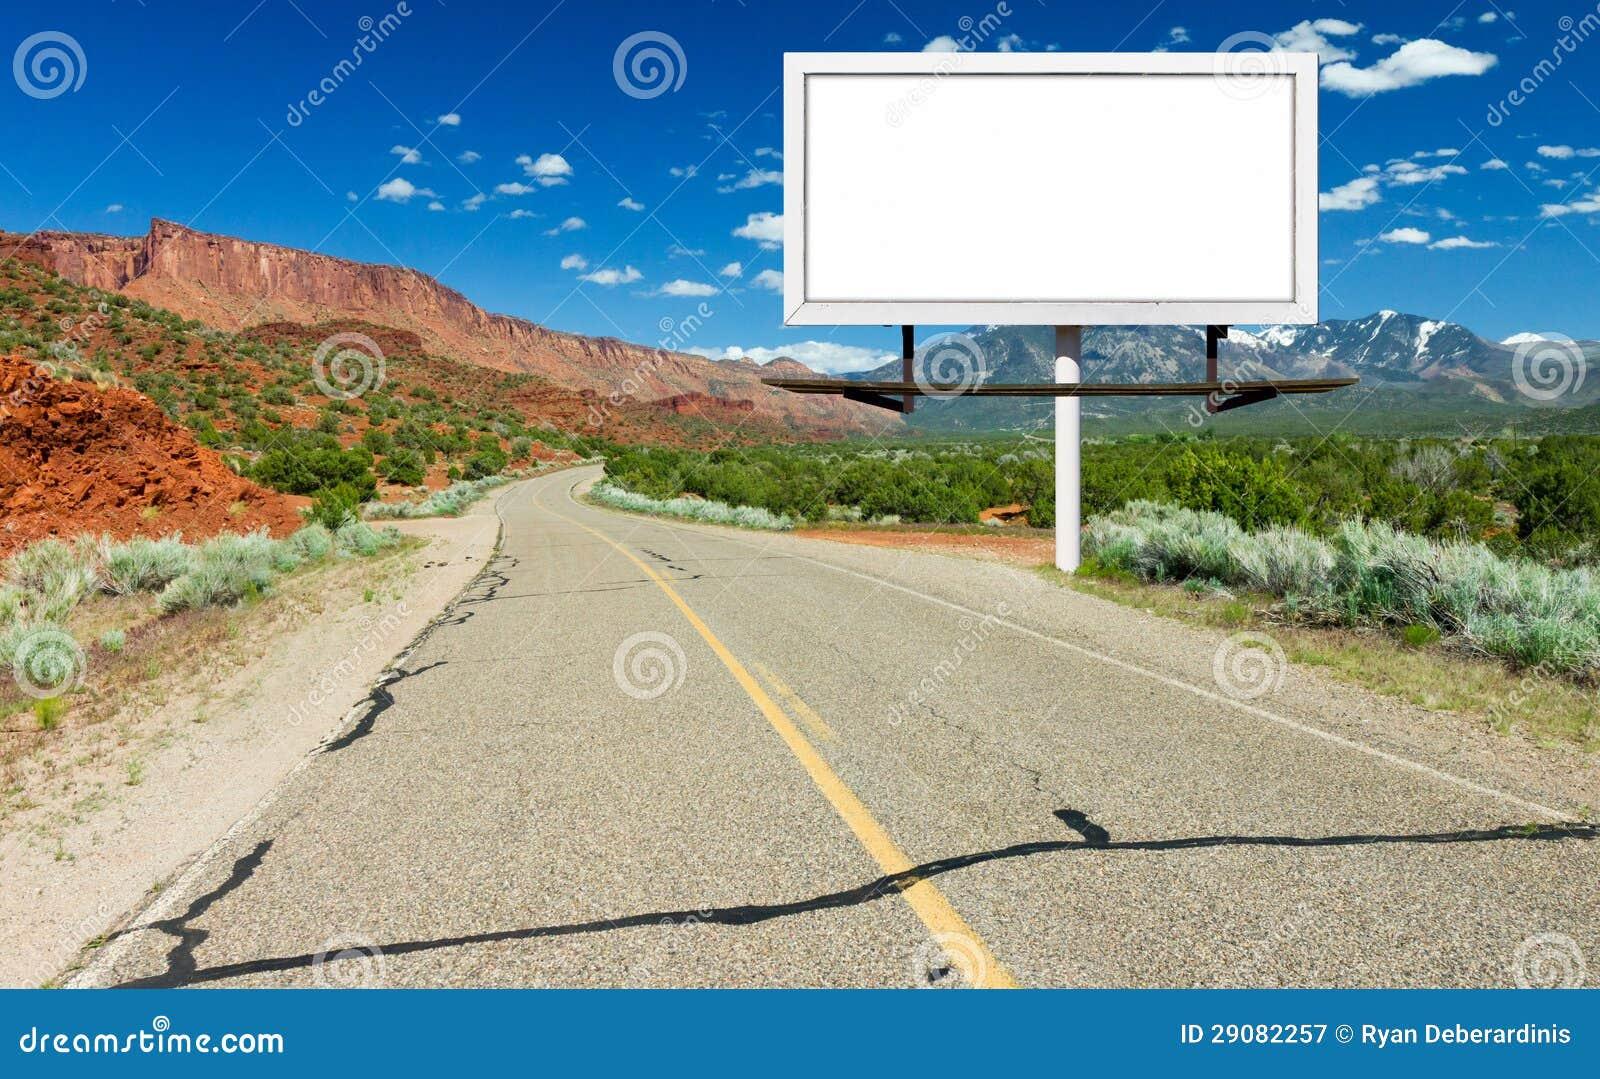 Blank Billboard Sign By Highway In Desert Royalty Free Stock ...